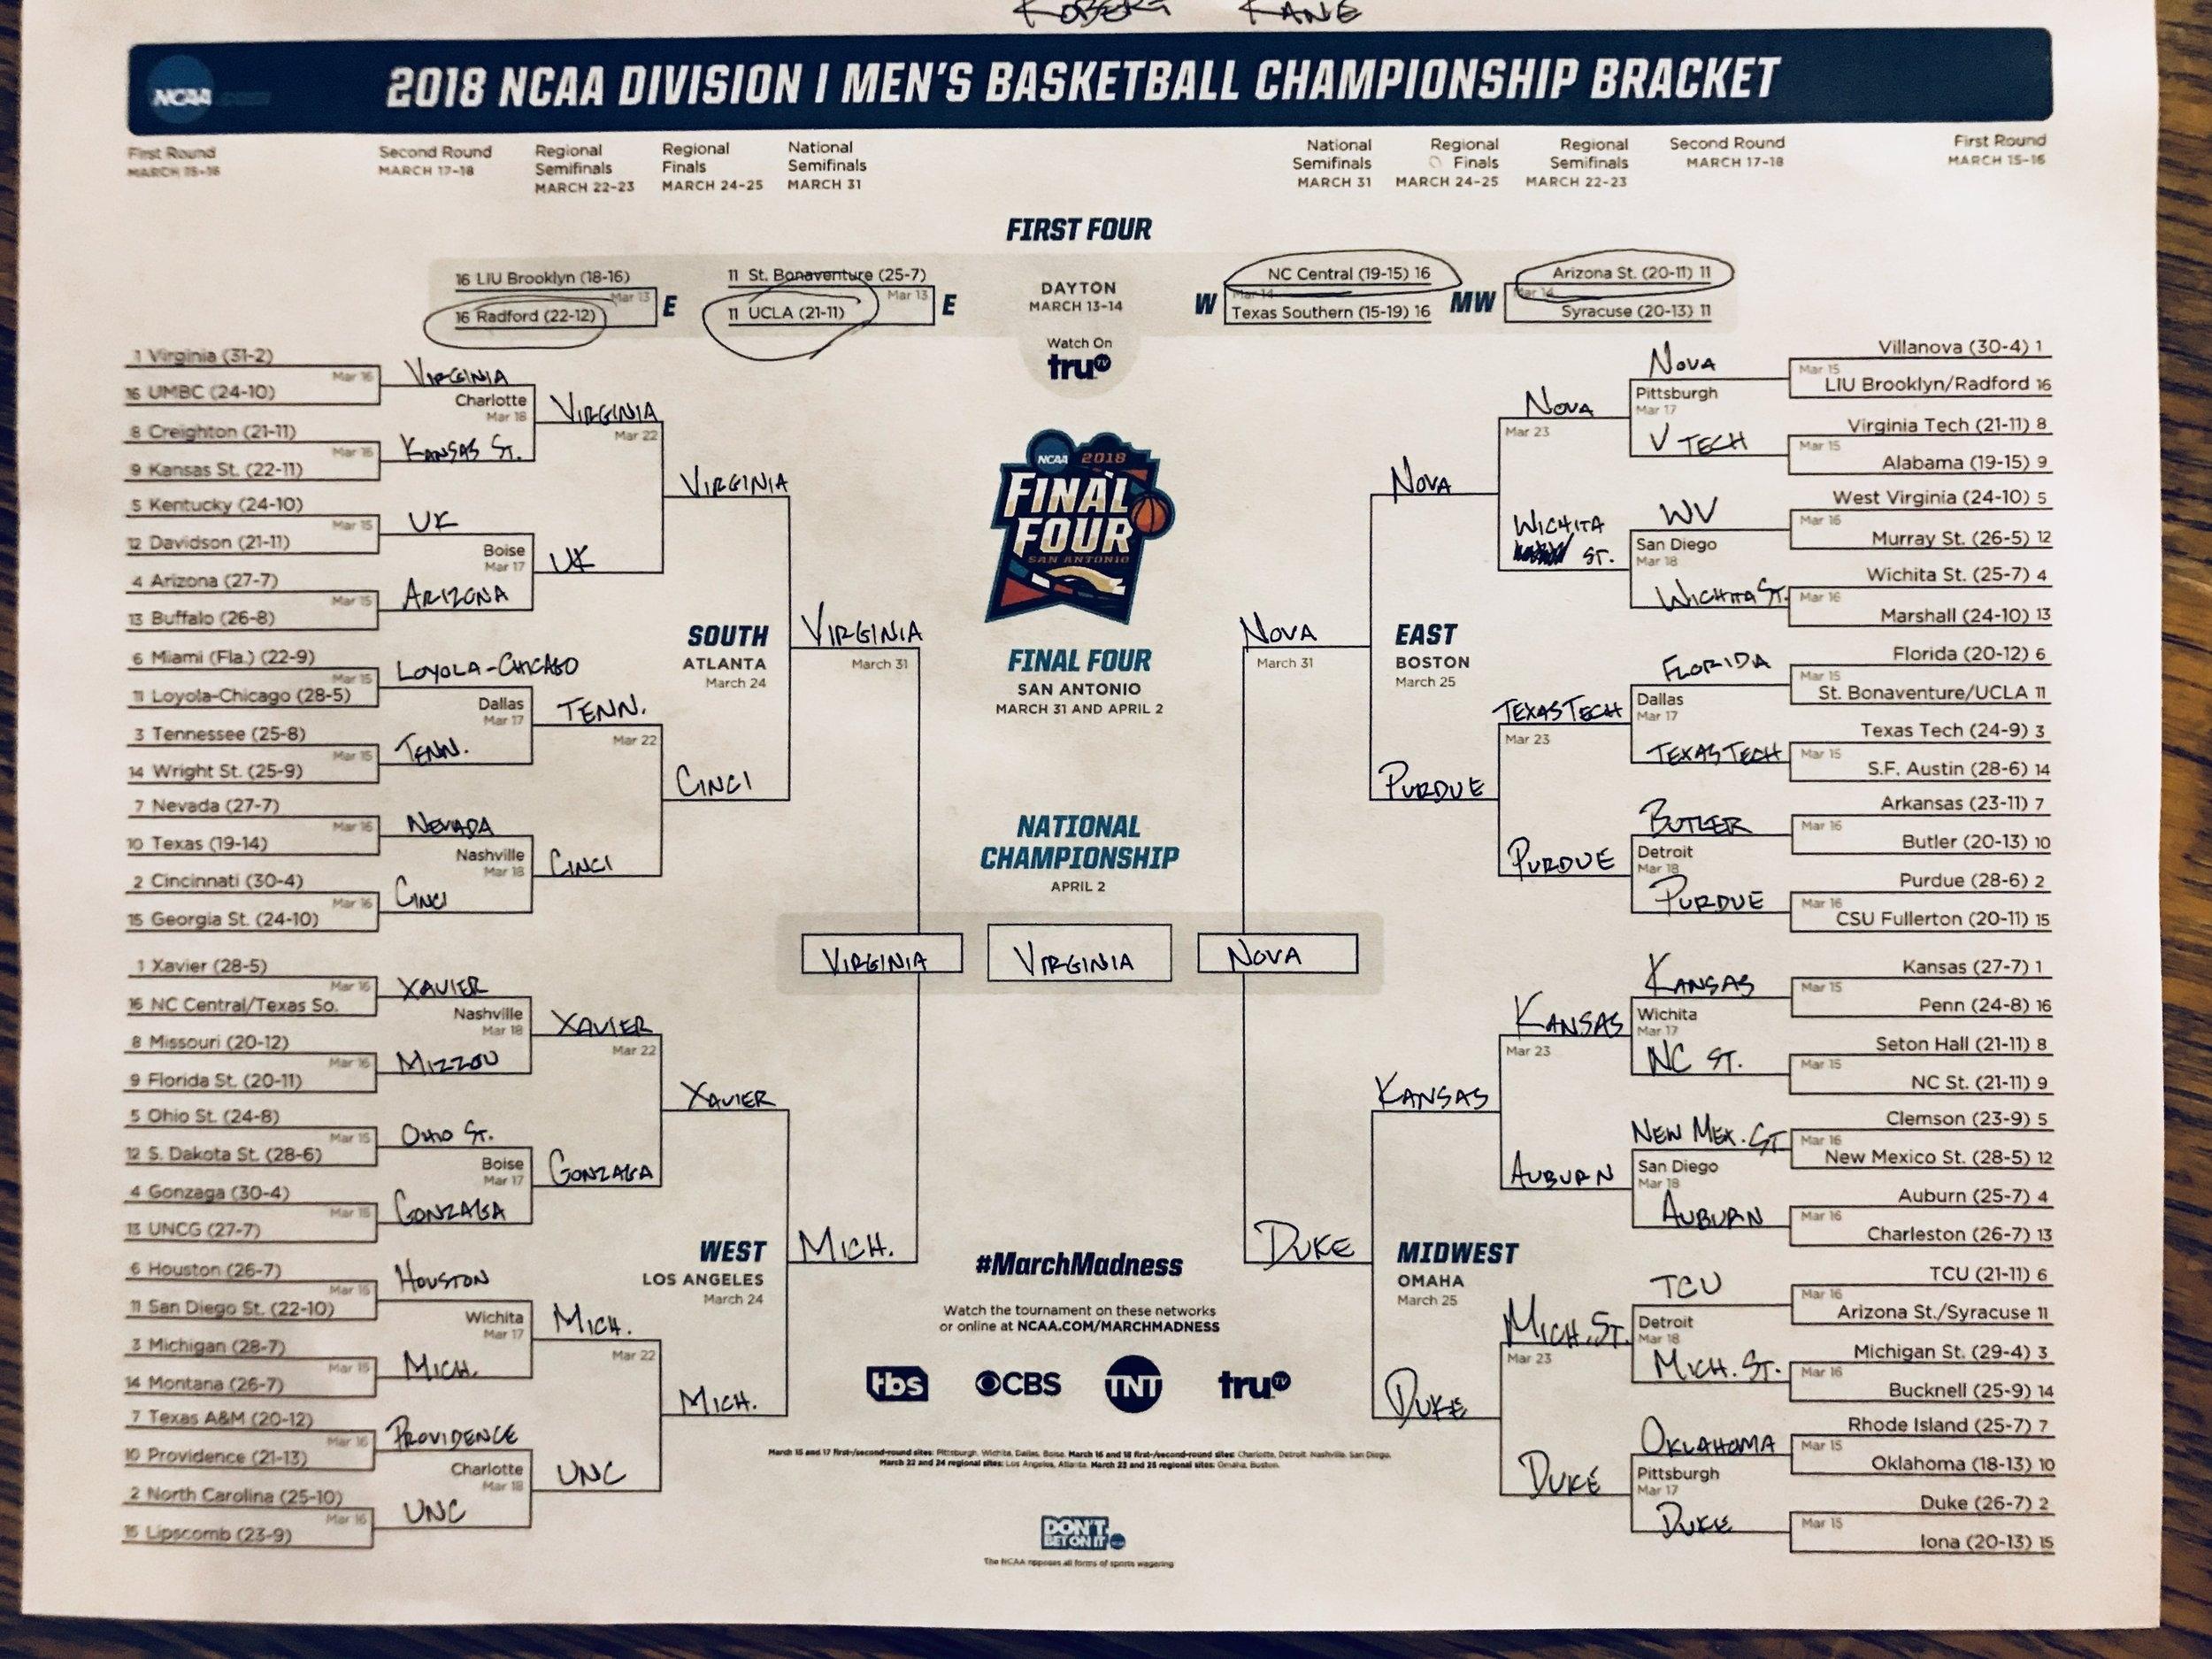 Rob's Final Four:  Virginia, Michigan, Villanova, Duke.   Rob's Champion:  Virginia